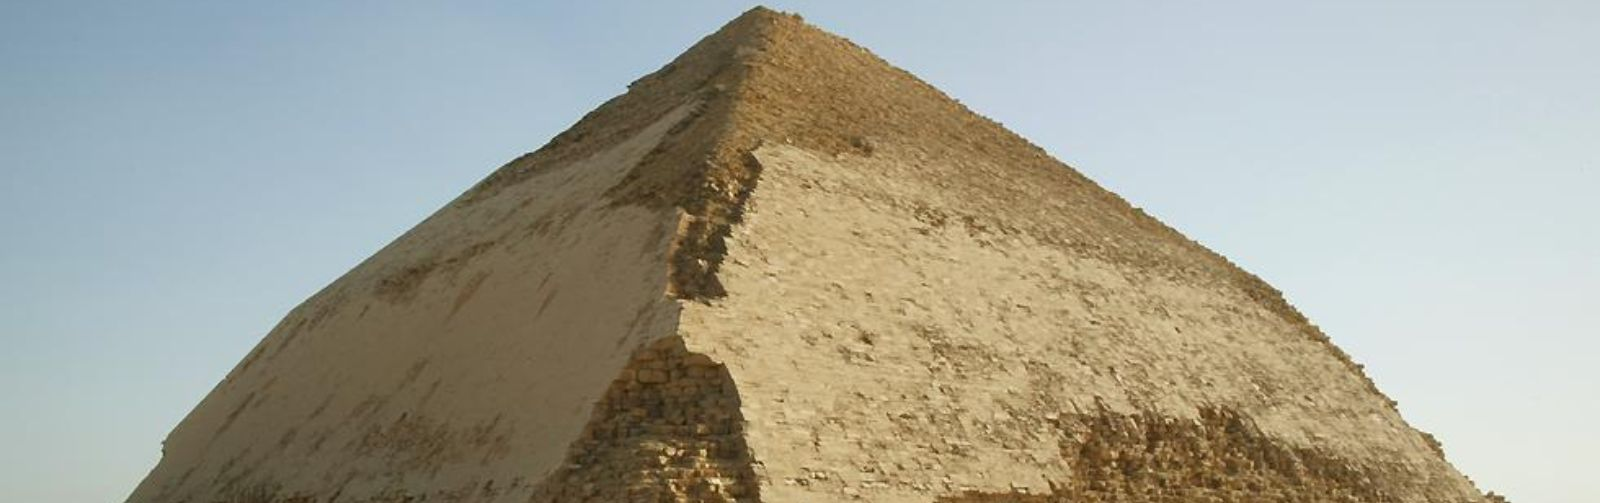 Dahshur Pyramids | the bent Pyramid and the red Pyramid